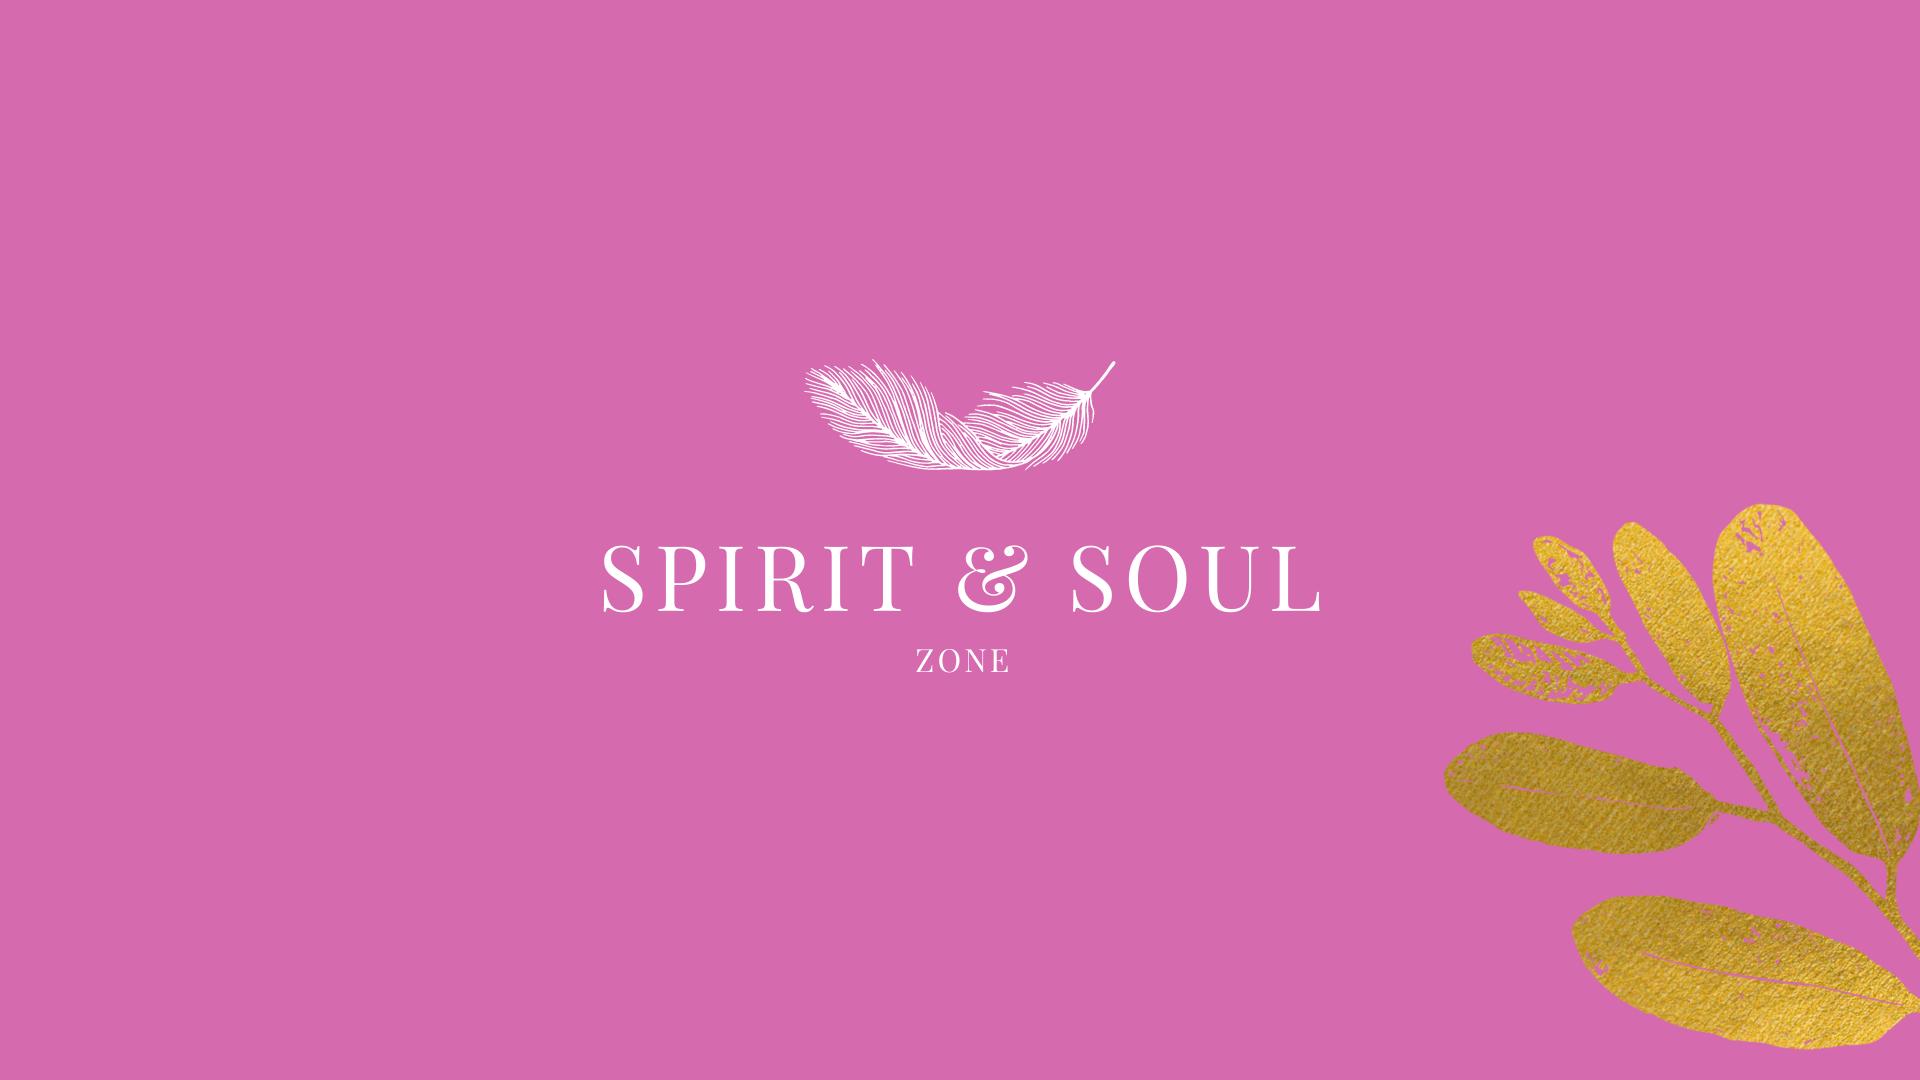 SPIRIT & SOUL